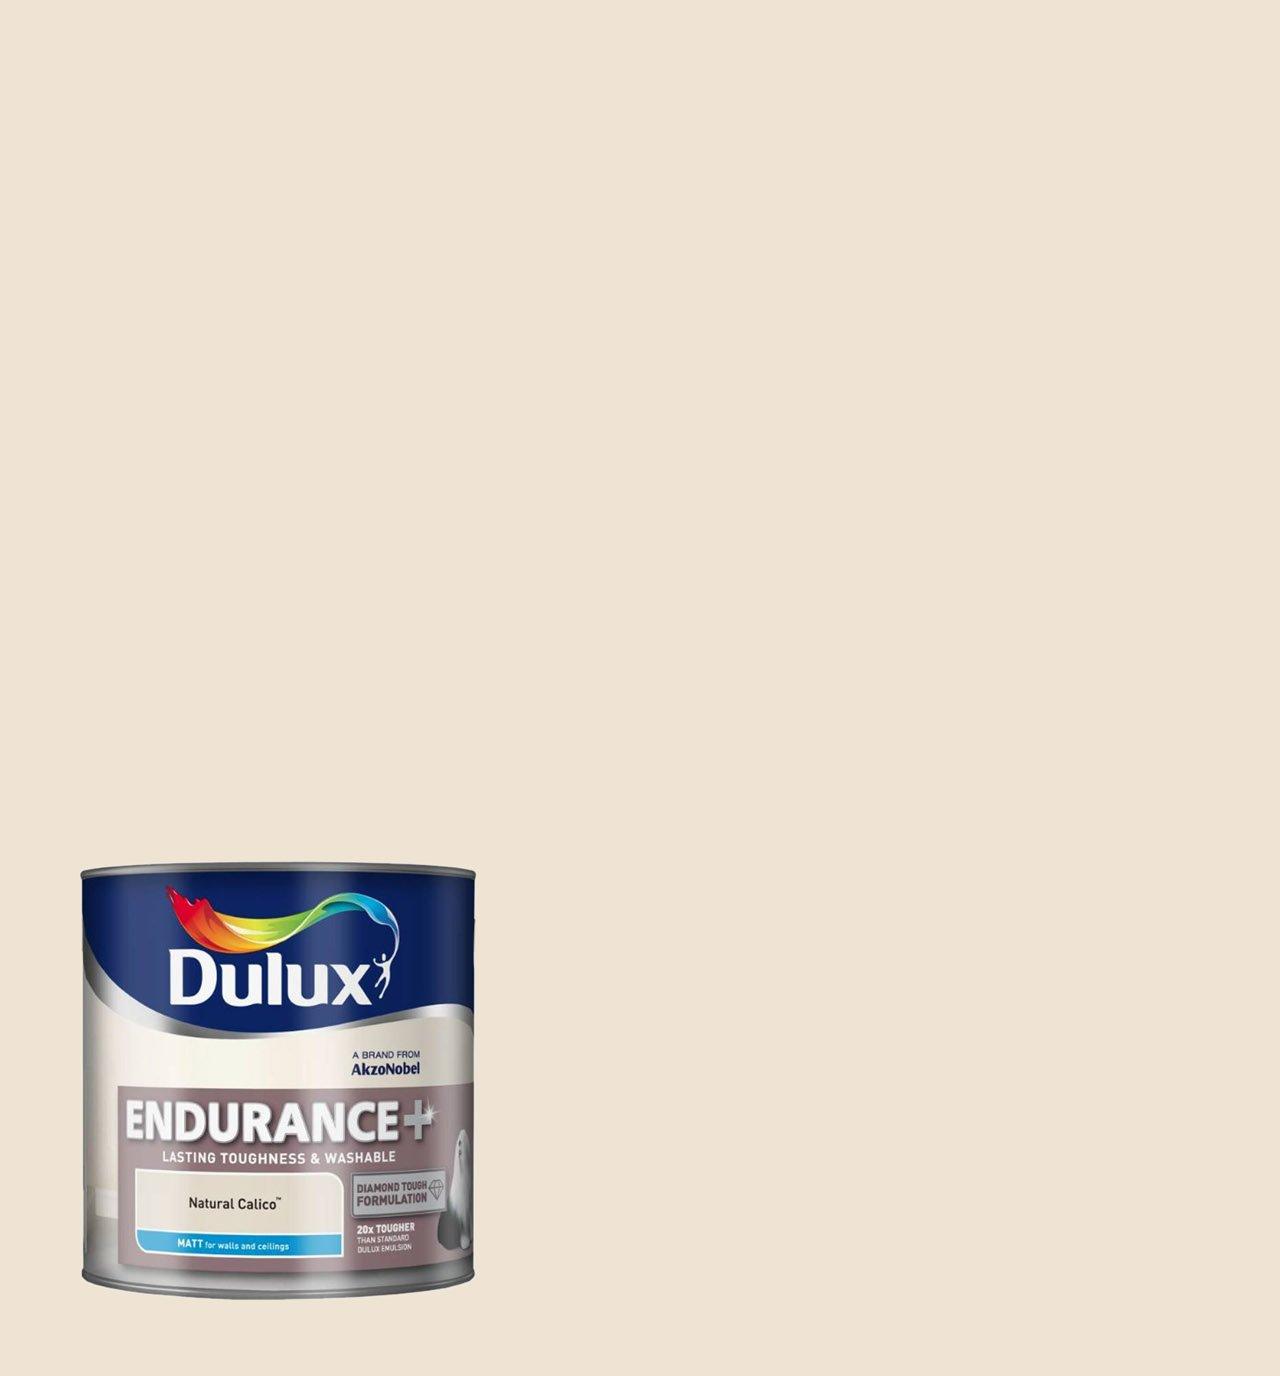 Dulux endurance matt paint for walls 2 5 l natural calico amazon co uk diy tools